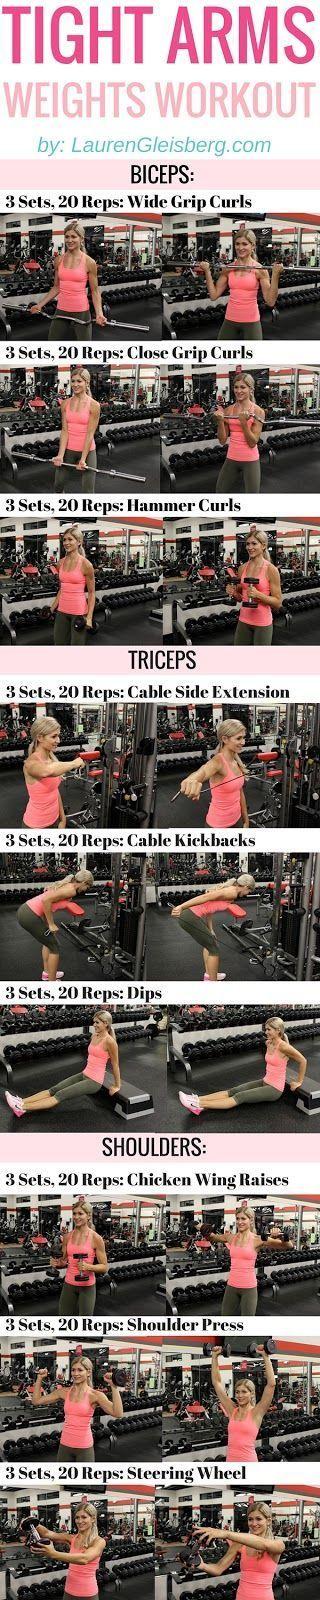 TIGHT ARMS WEIGHT TRAINING WORKOUT #LGBeautyAndBooty Challenge Week 2, Day 2 - LaurenGleisberg.com